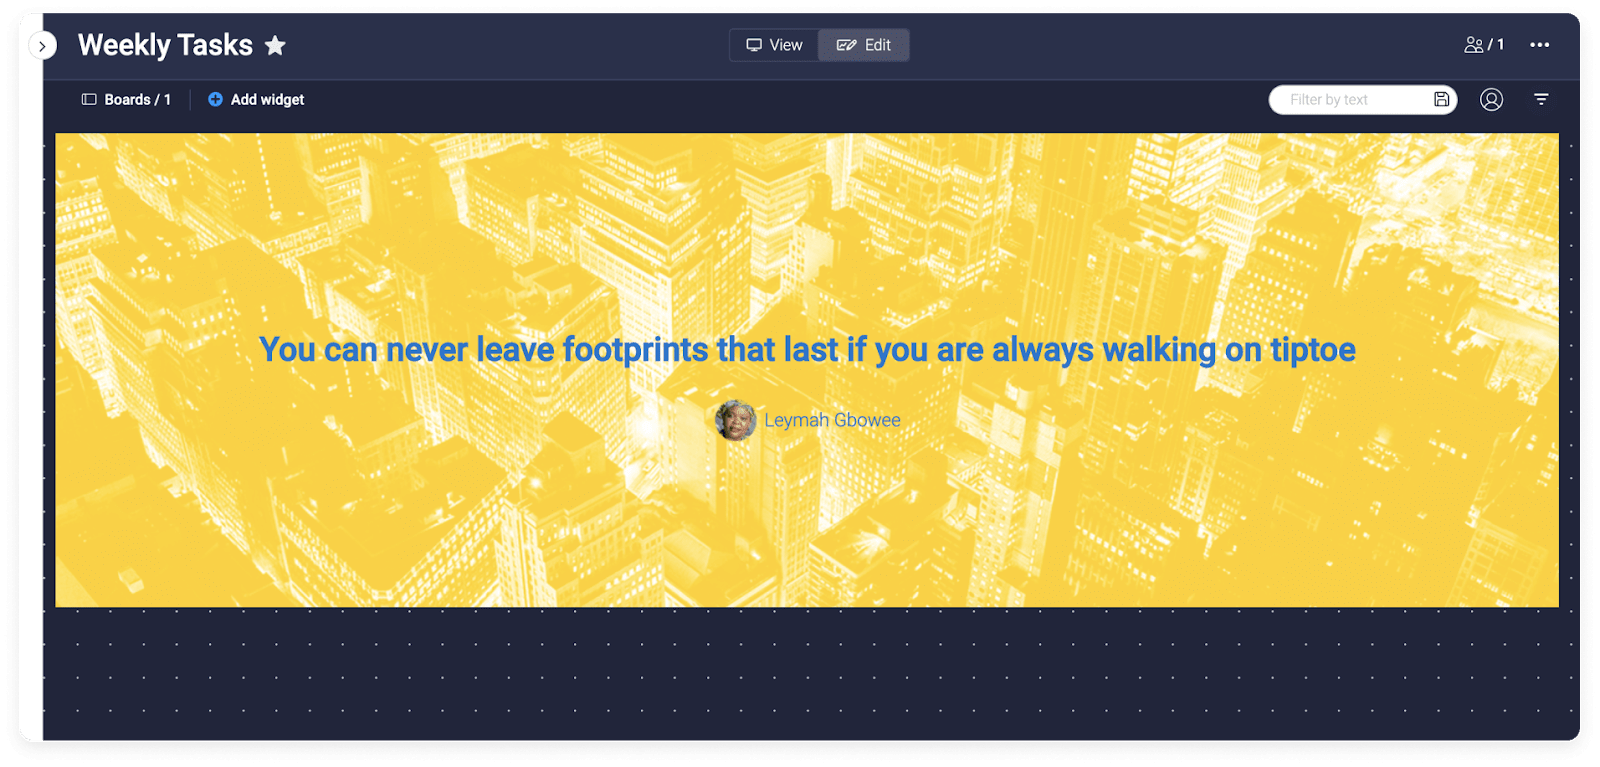 monday.com's quote of the day widget example